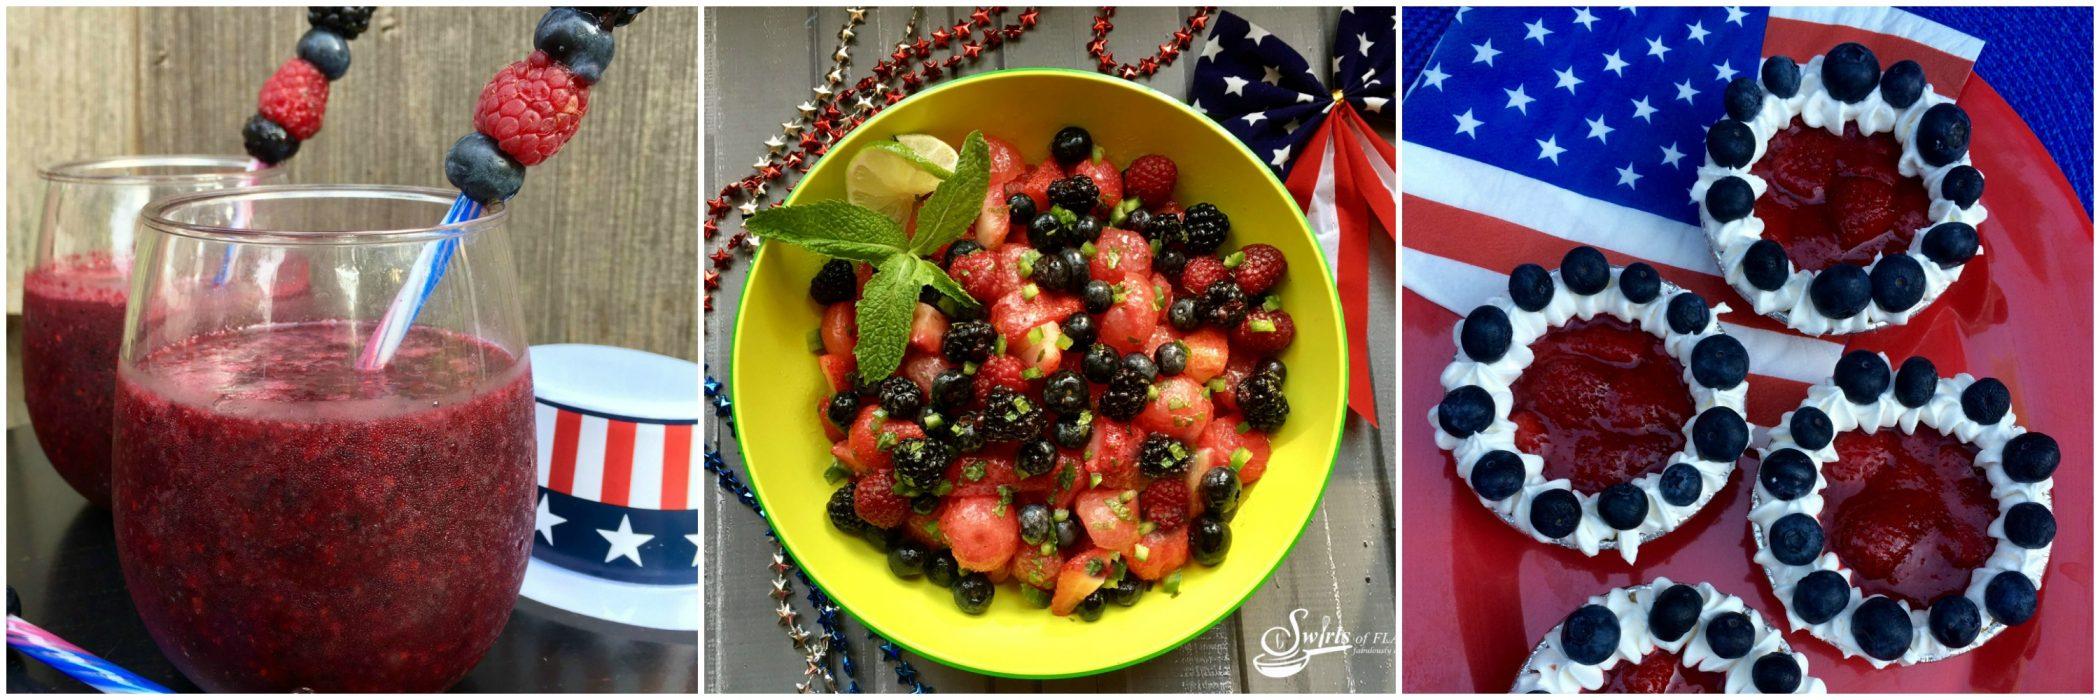 Left to Right: Berry Sangria Slushy; Jalapeno Lime Fruit Salad; Berry Tartlets